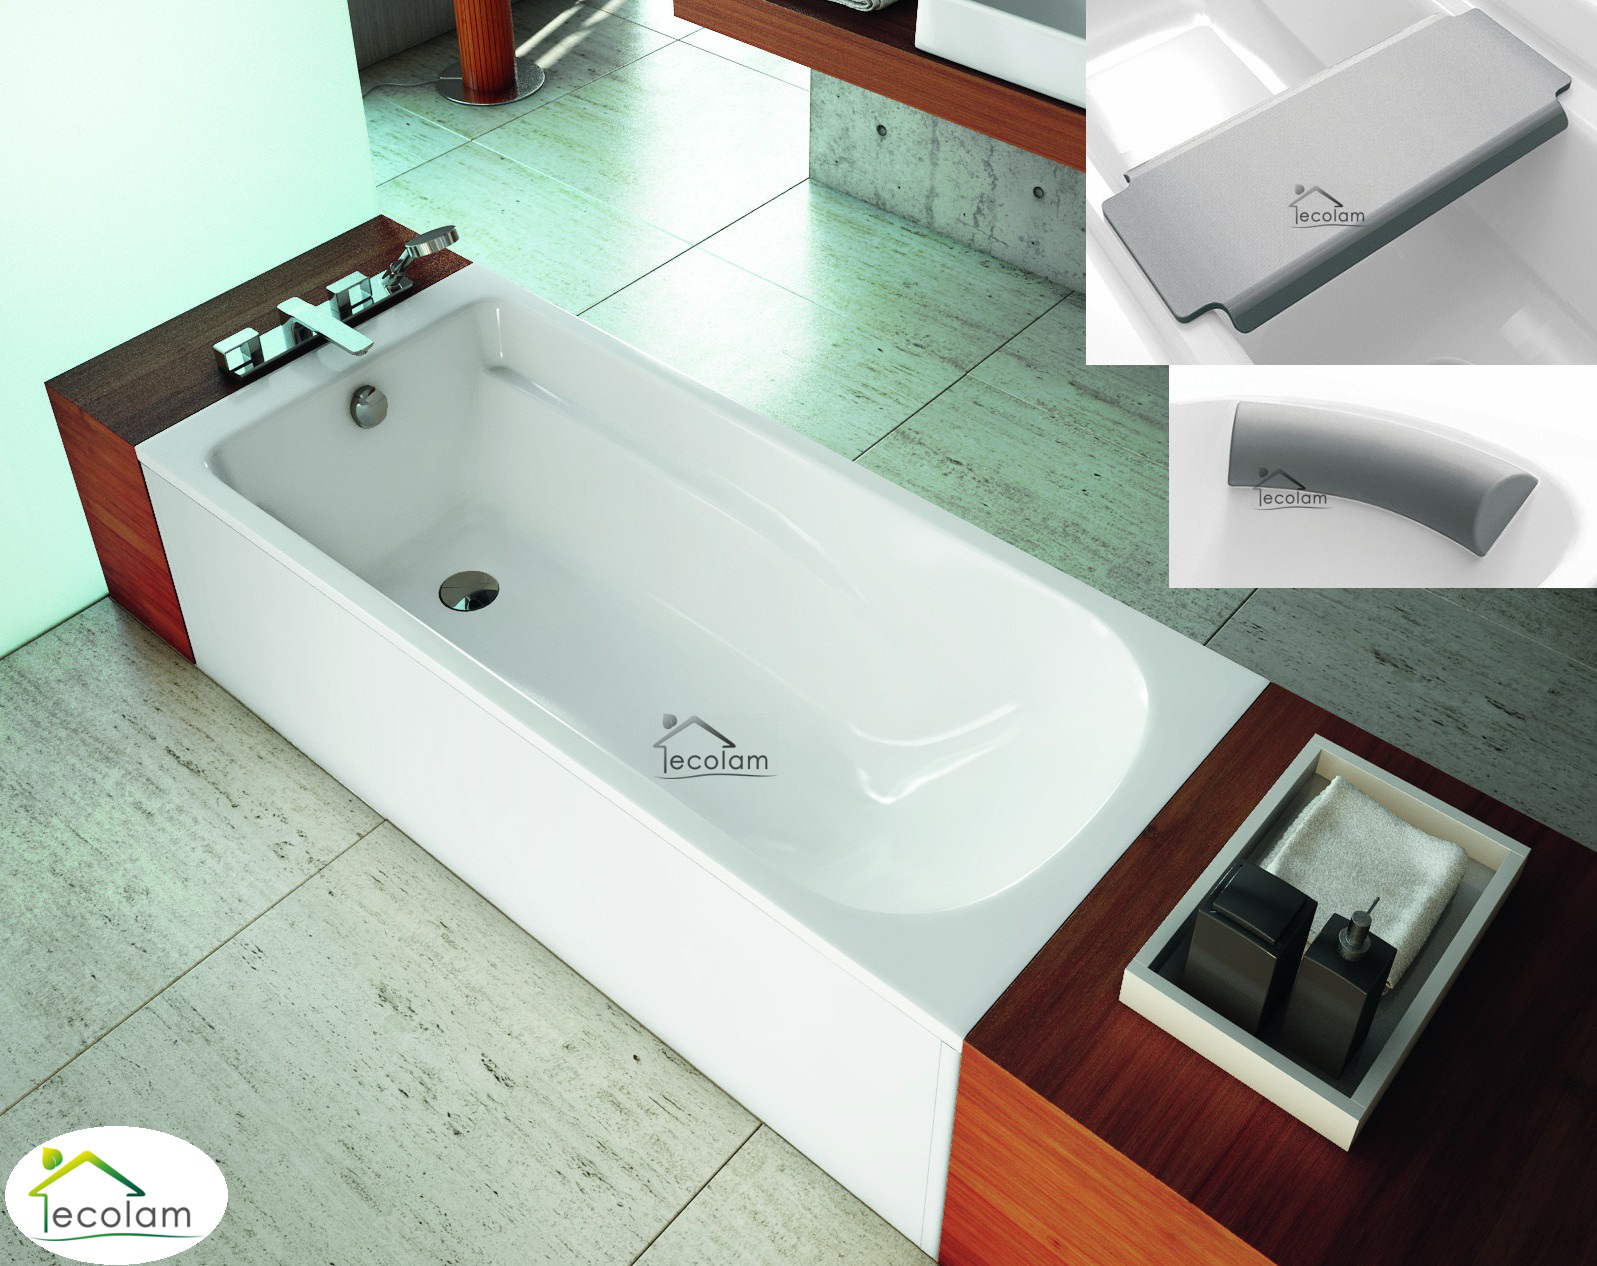 badewanne rechteck wanne 160 x 80 cm f e kopfst tze sitz. Black Bedroom Furniture Sets. Home Design Ideas